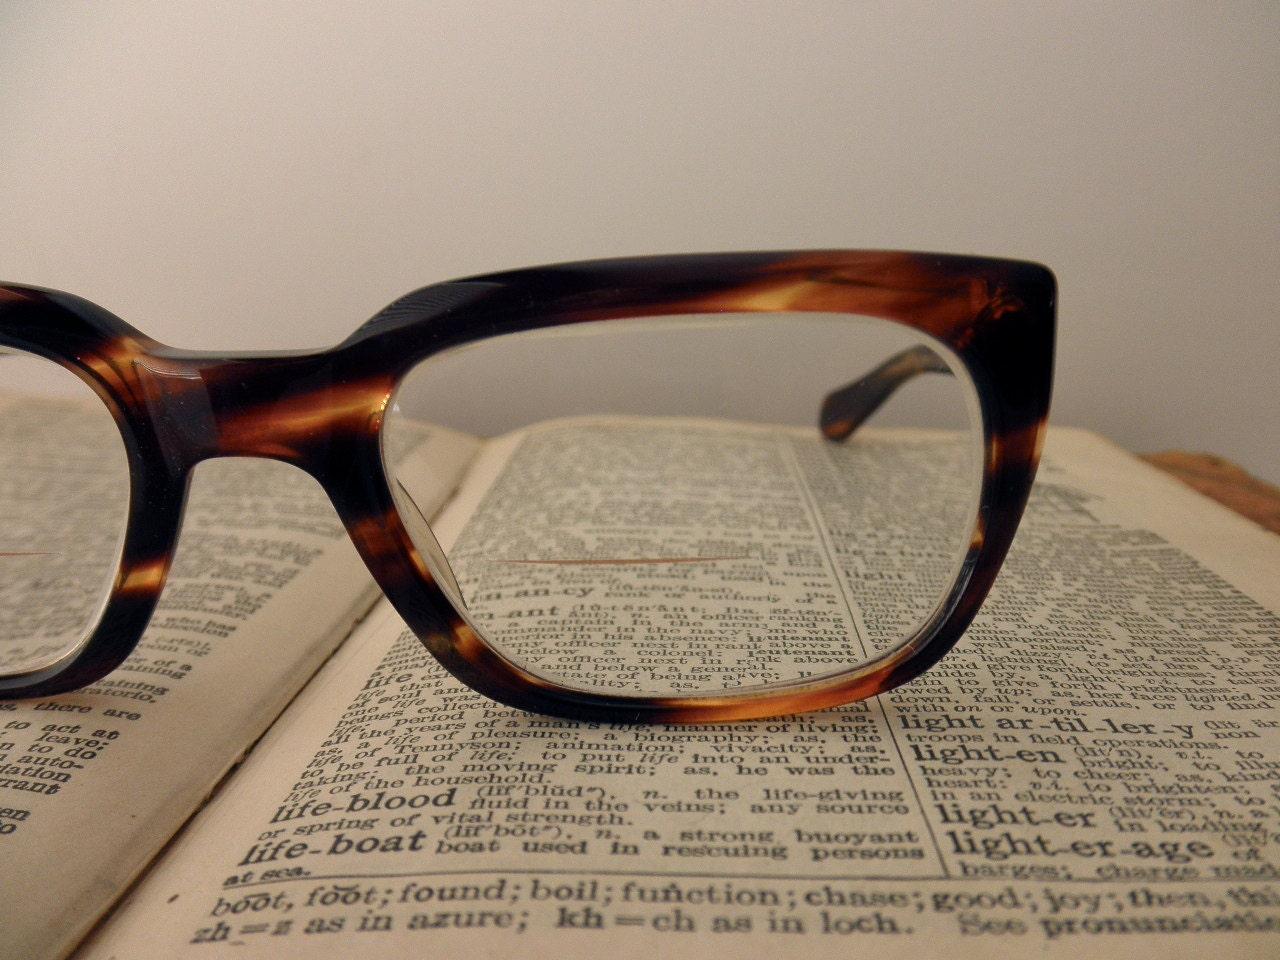 Vintage Tortoise Shell Eyeglass Frames : vintage Rodenstock tortoise shell eyeglass frames glasses